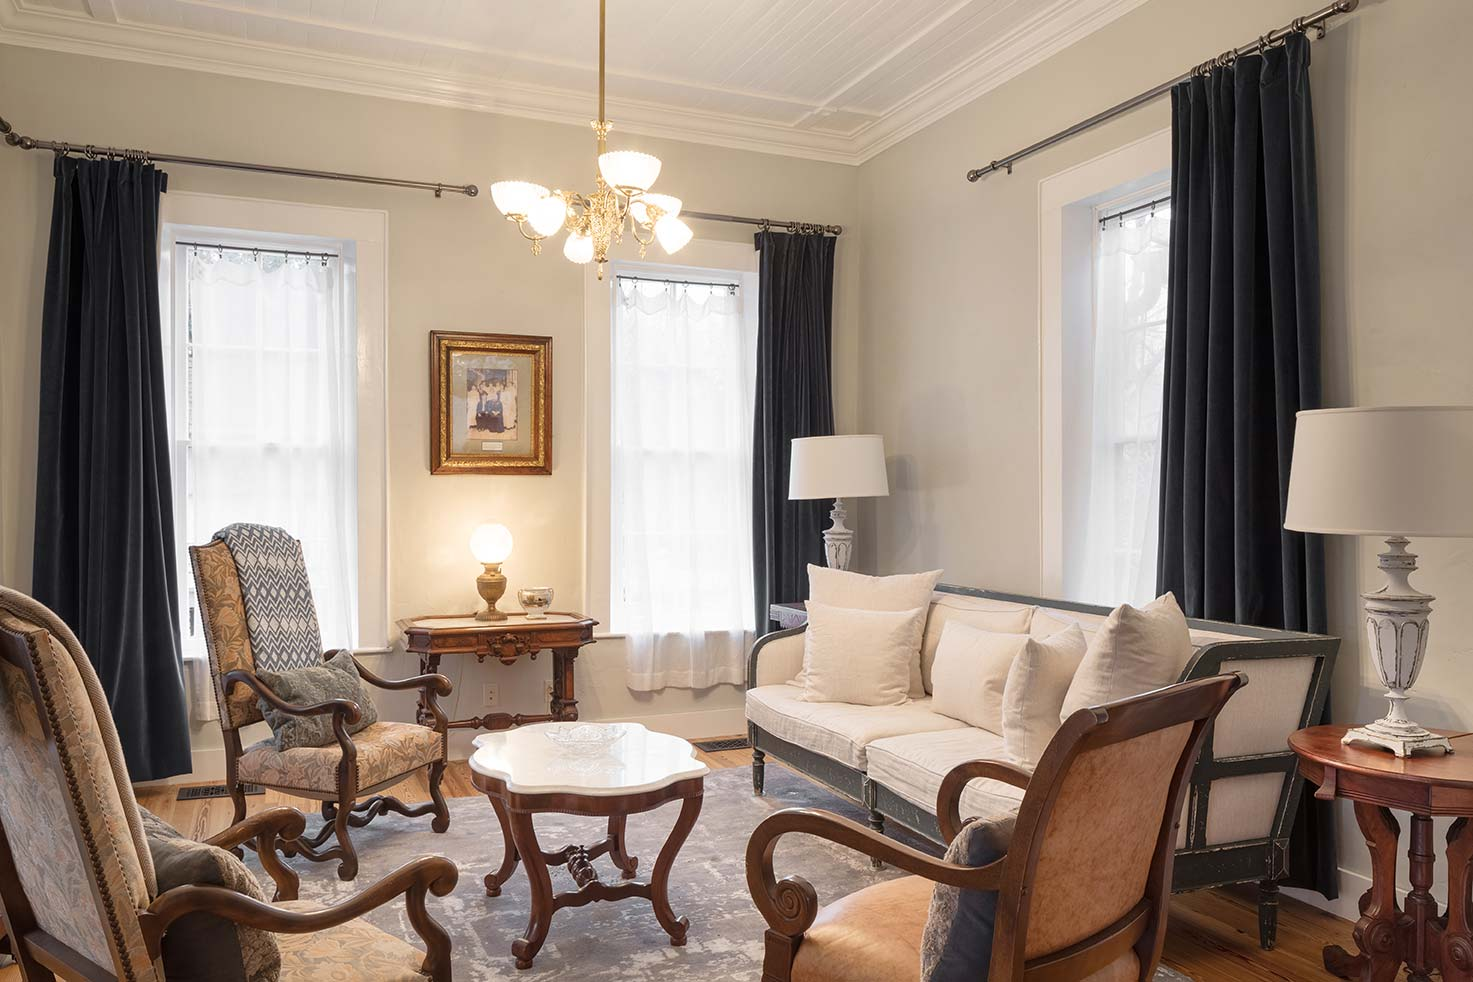 blacksmith-quarters-fredericksburg-realty-texas-commercial-real-estate-for-sale-wedding-livingroom-investment-venue.jpg